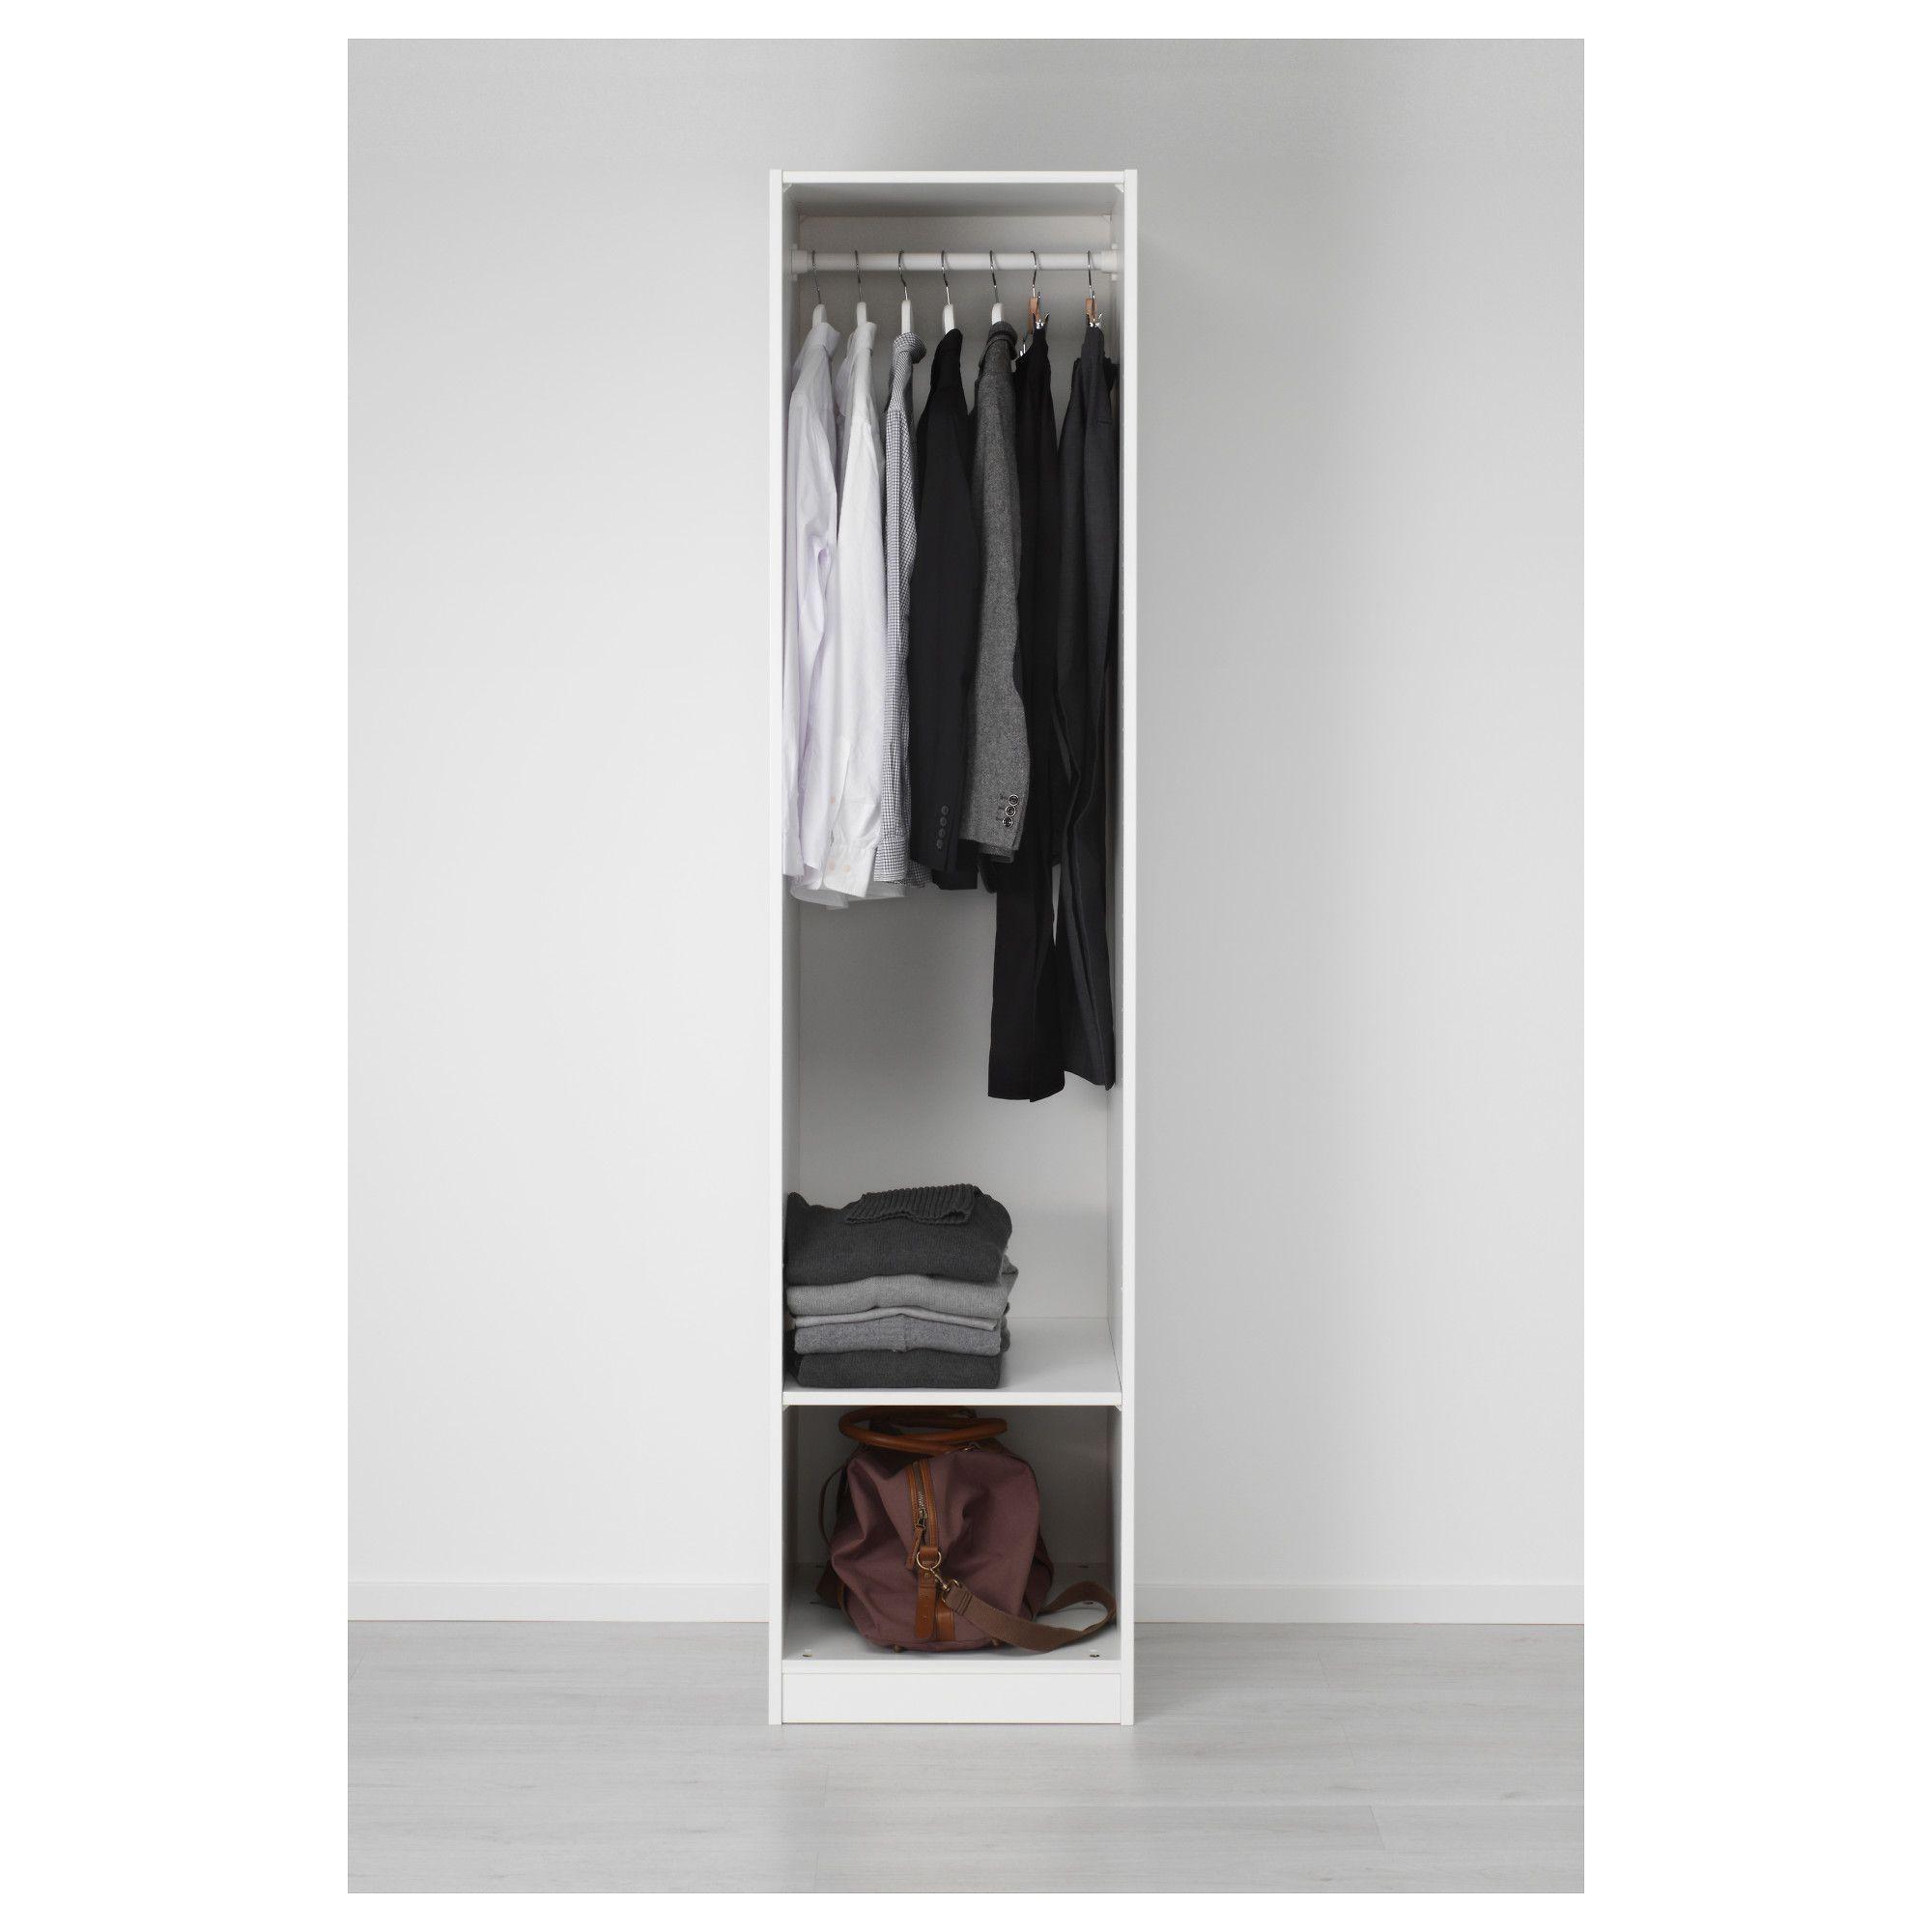 Wardrobe, white, Vikedal mirror glass, 19 5/8x23 5/8x79 1